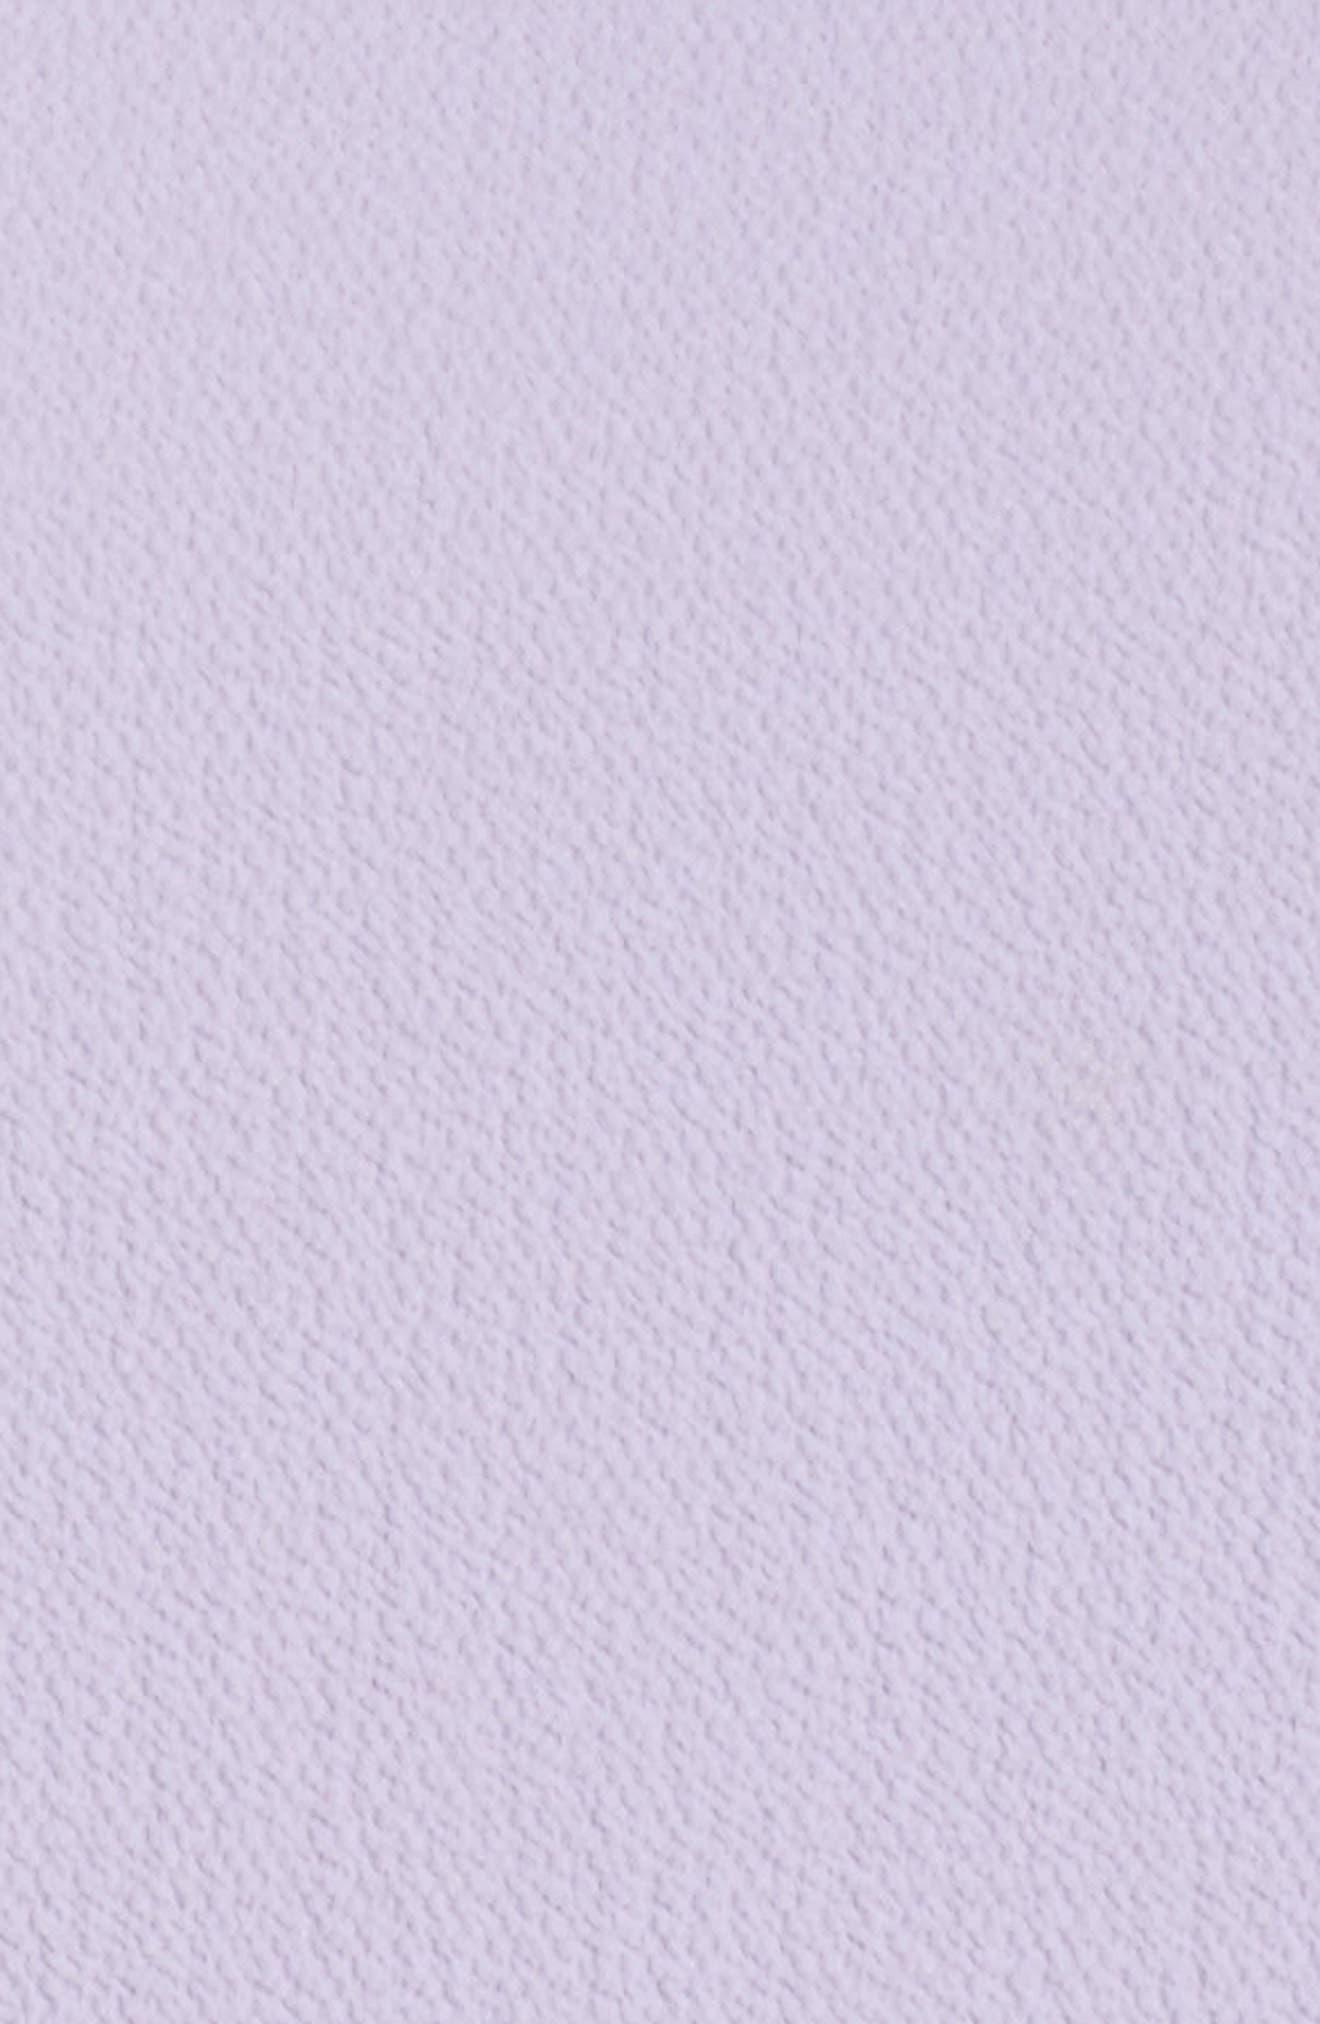 Cold Shoulder Flare Cuff Top,                             Alternate thumbnail 5, color,                             CROCUS PET